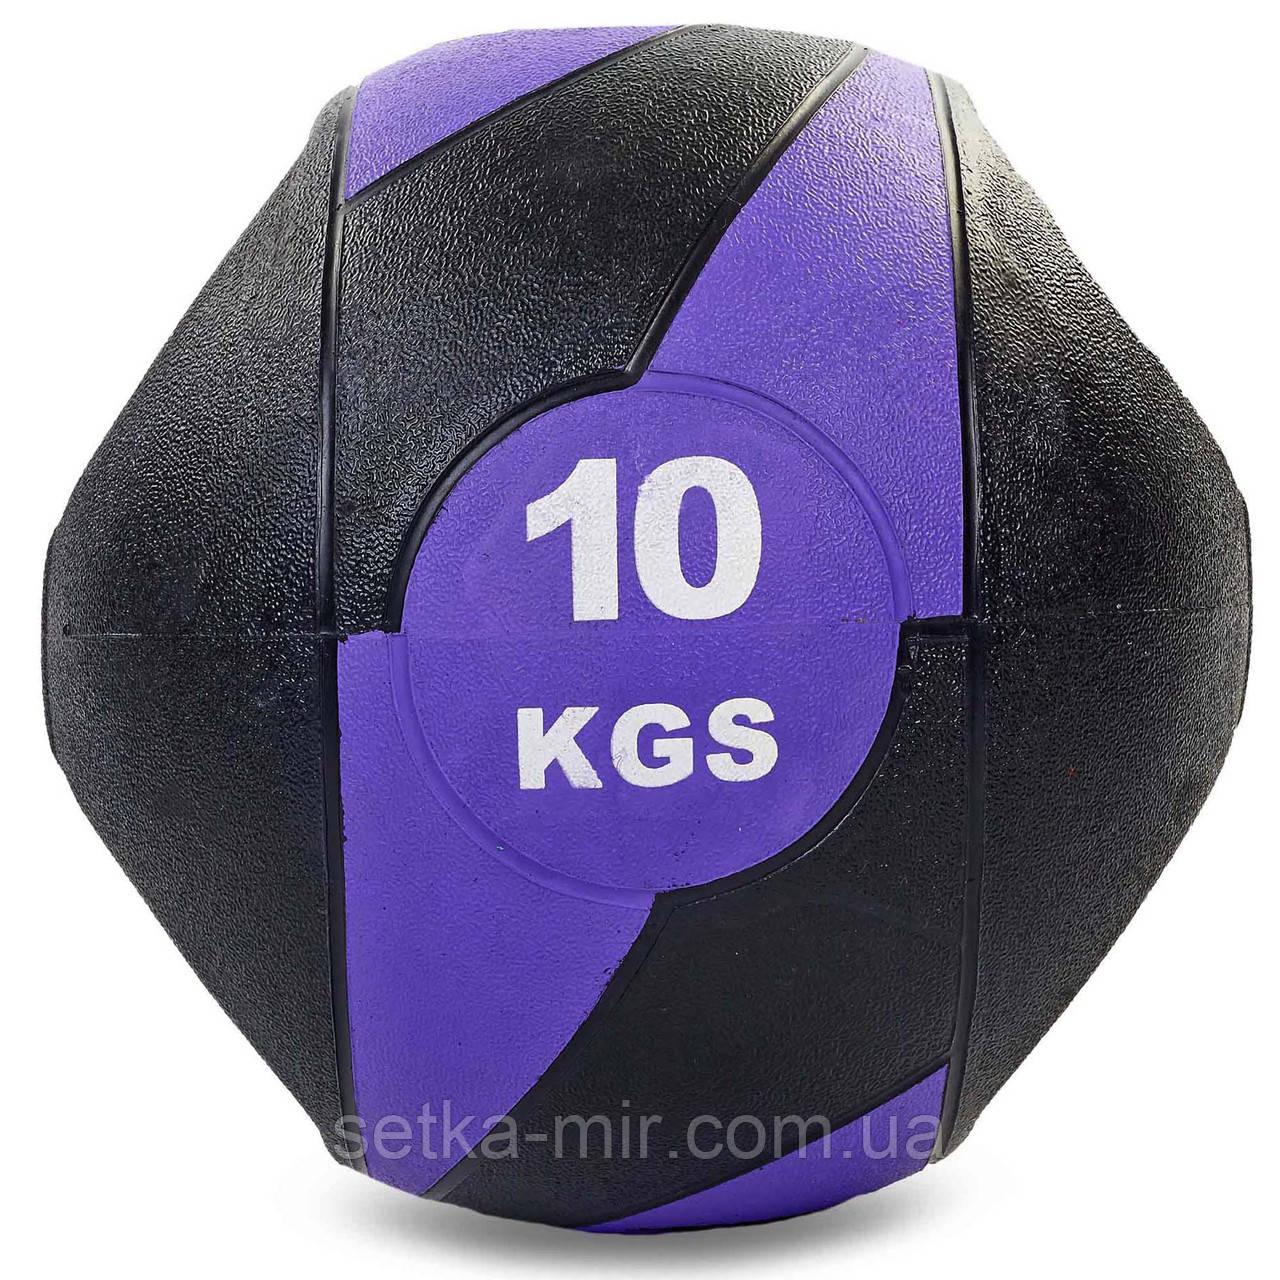 Мяч медицинский медбол с двумя рукоятками Record Medicine Ball FI-5111-10 10кг